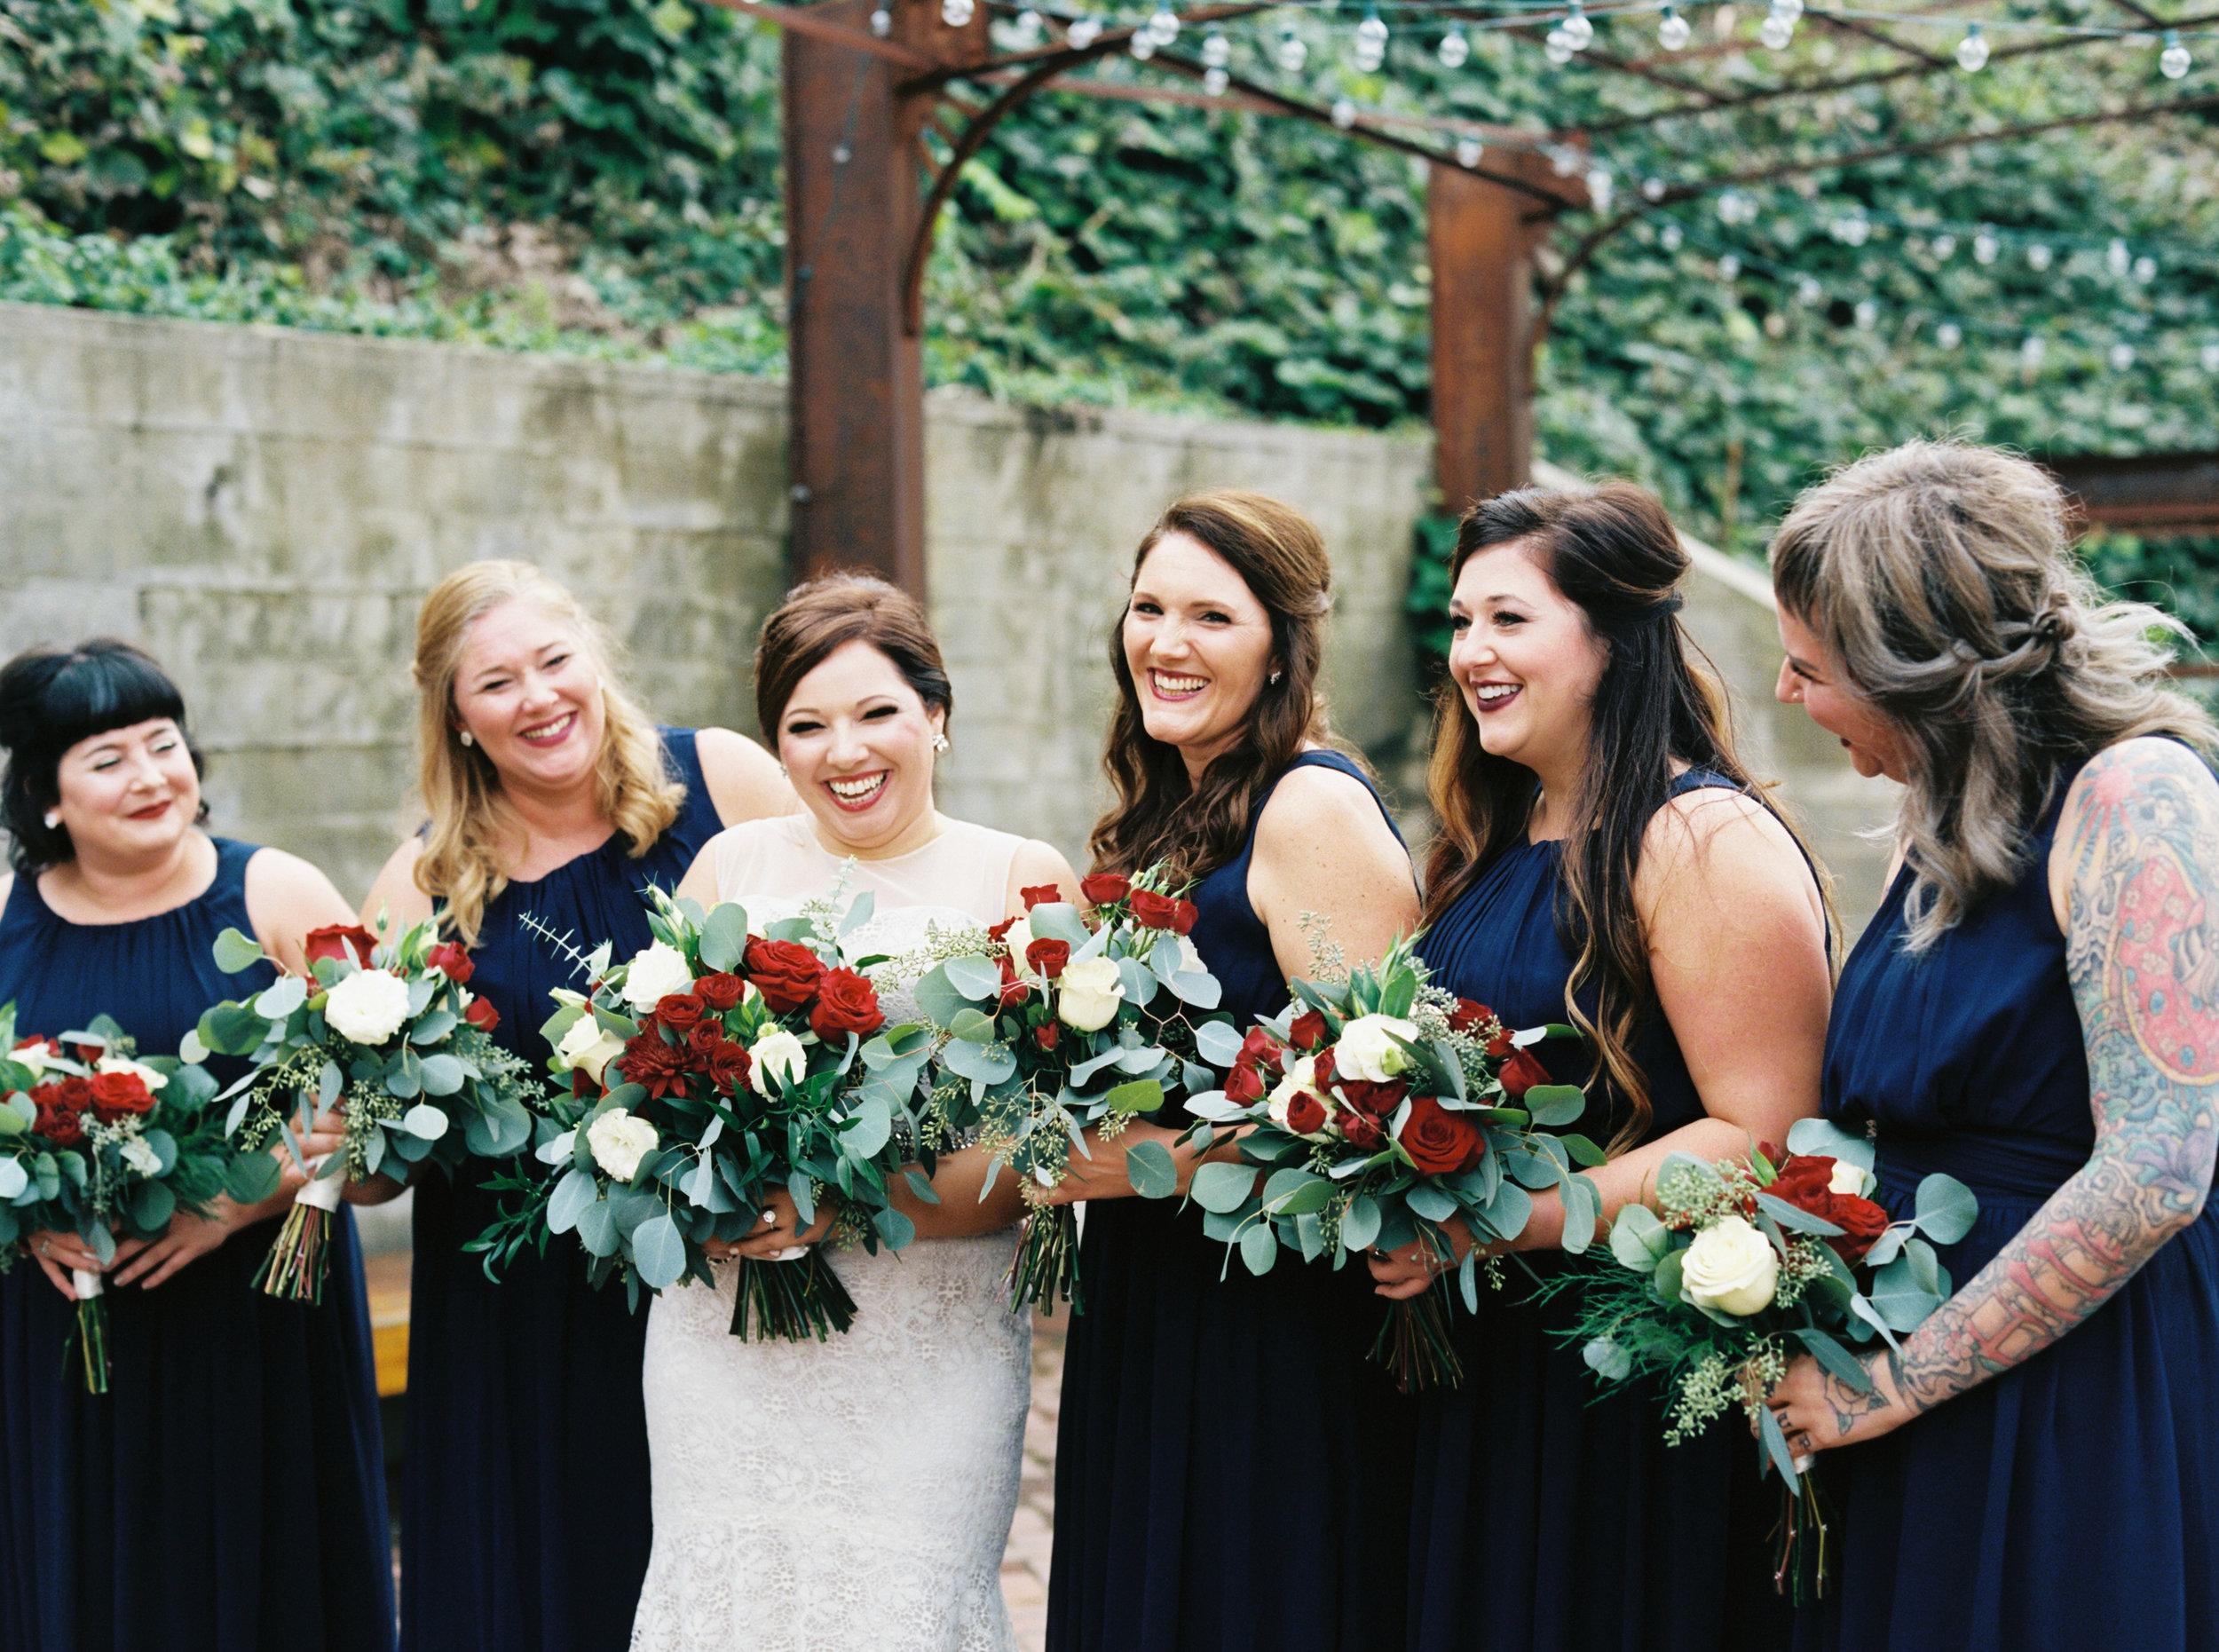 Jessica_Bryan_Wedding_Standard_Knoxville_Abigail_Malone_Photography-322.jpg